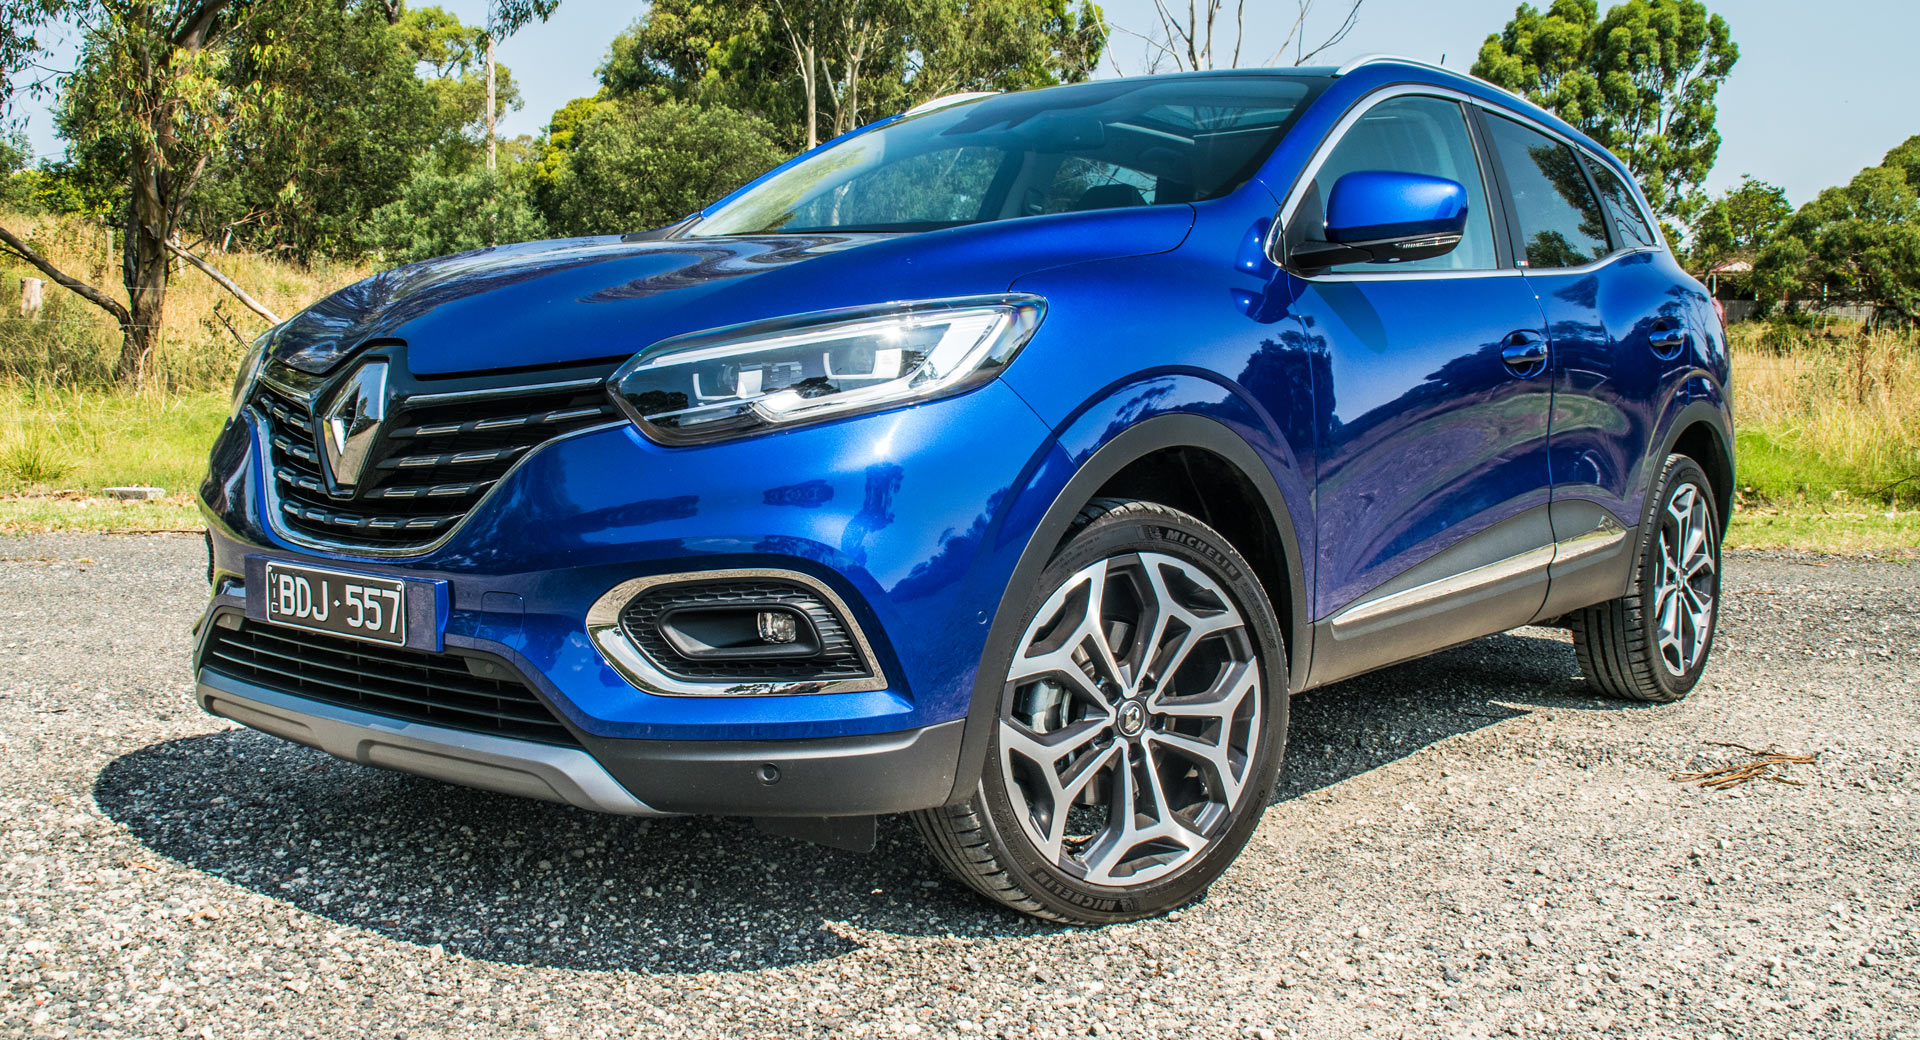 Renault Kadjar Kokemuksia